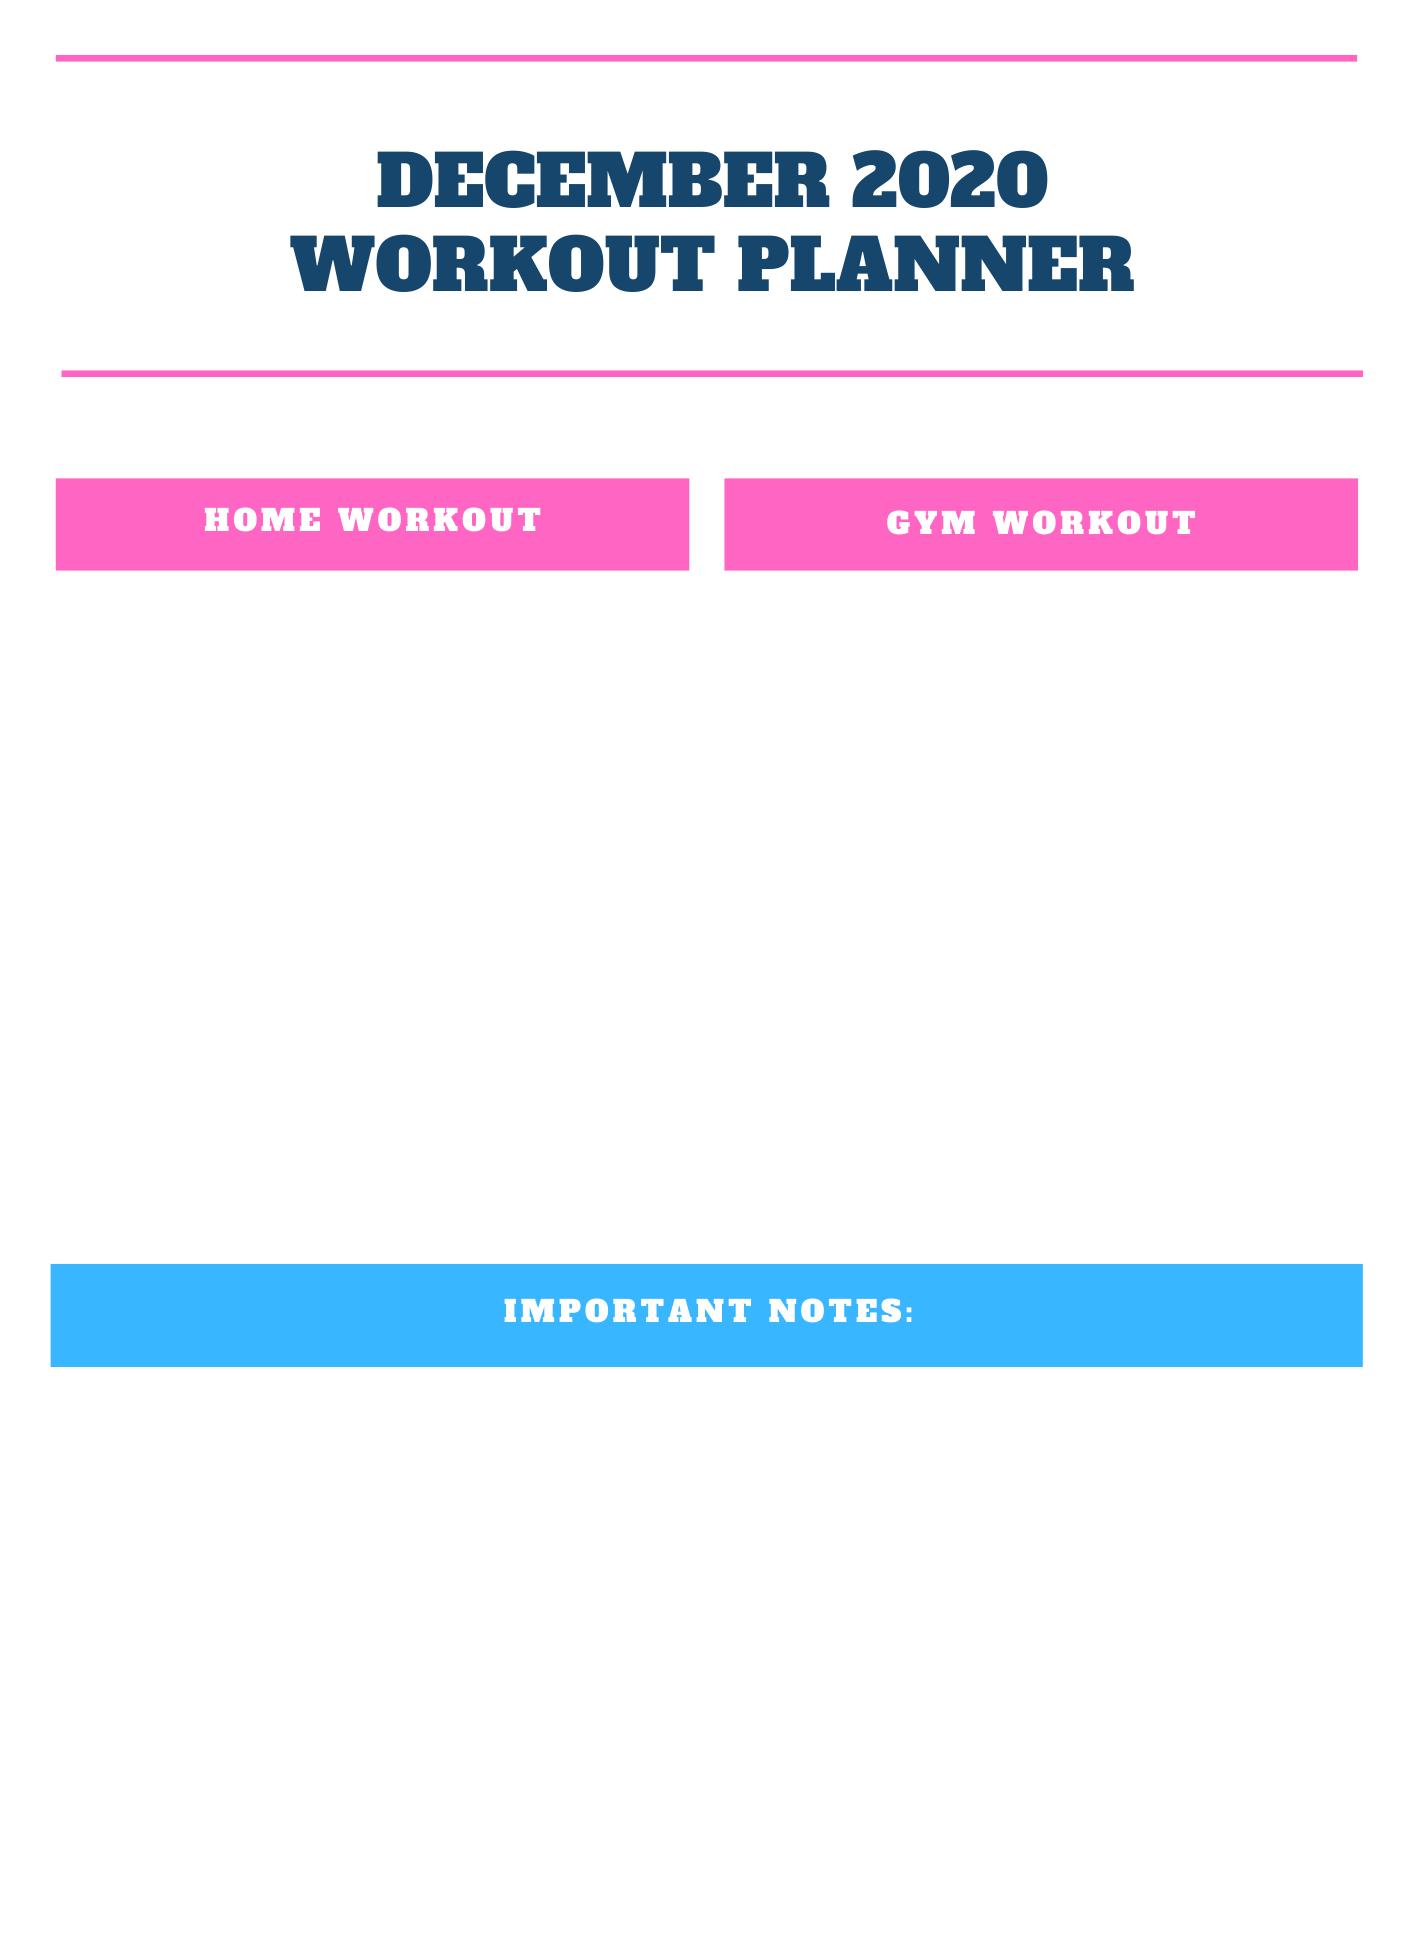 December 2020 Workout Planner